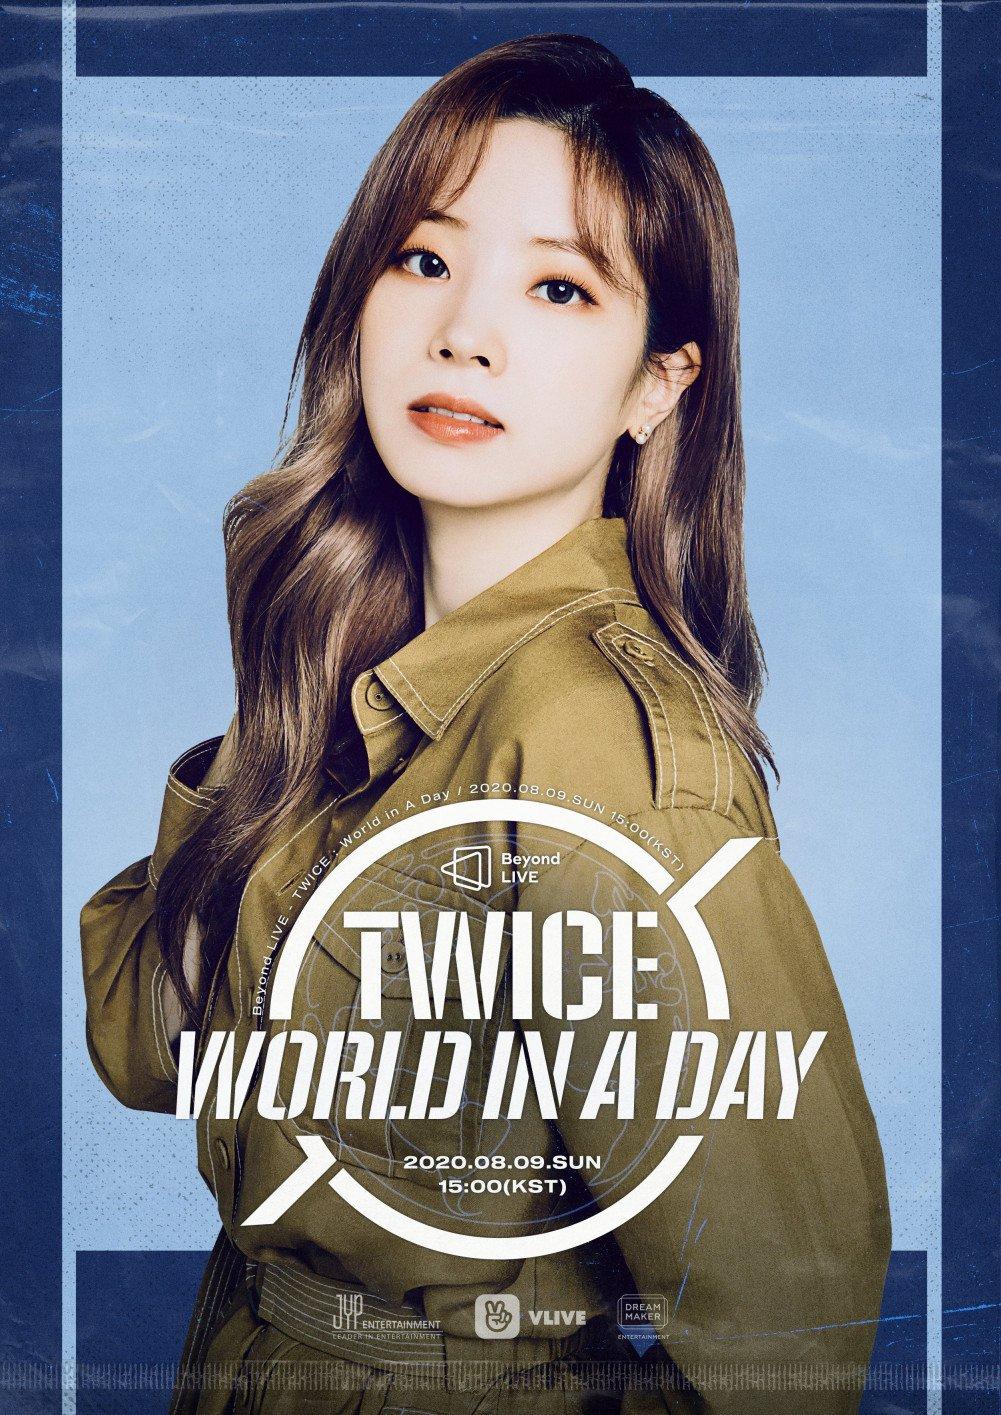 twice-members-teaser-posters-online-concert-1